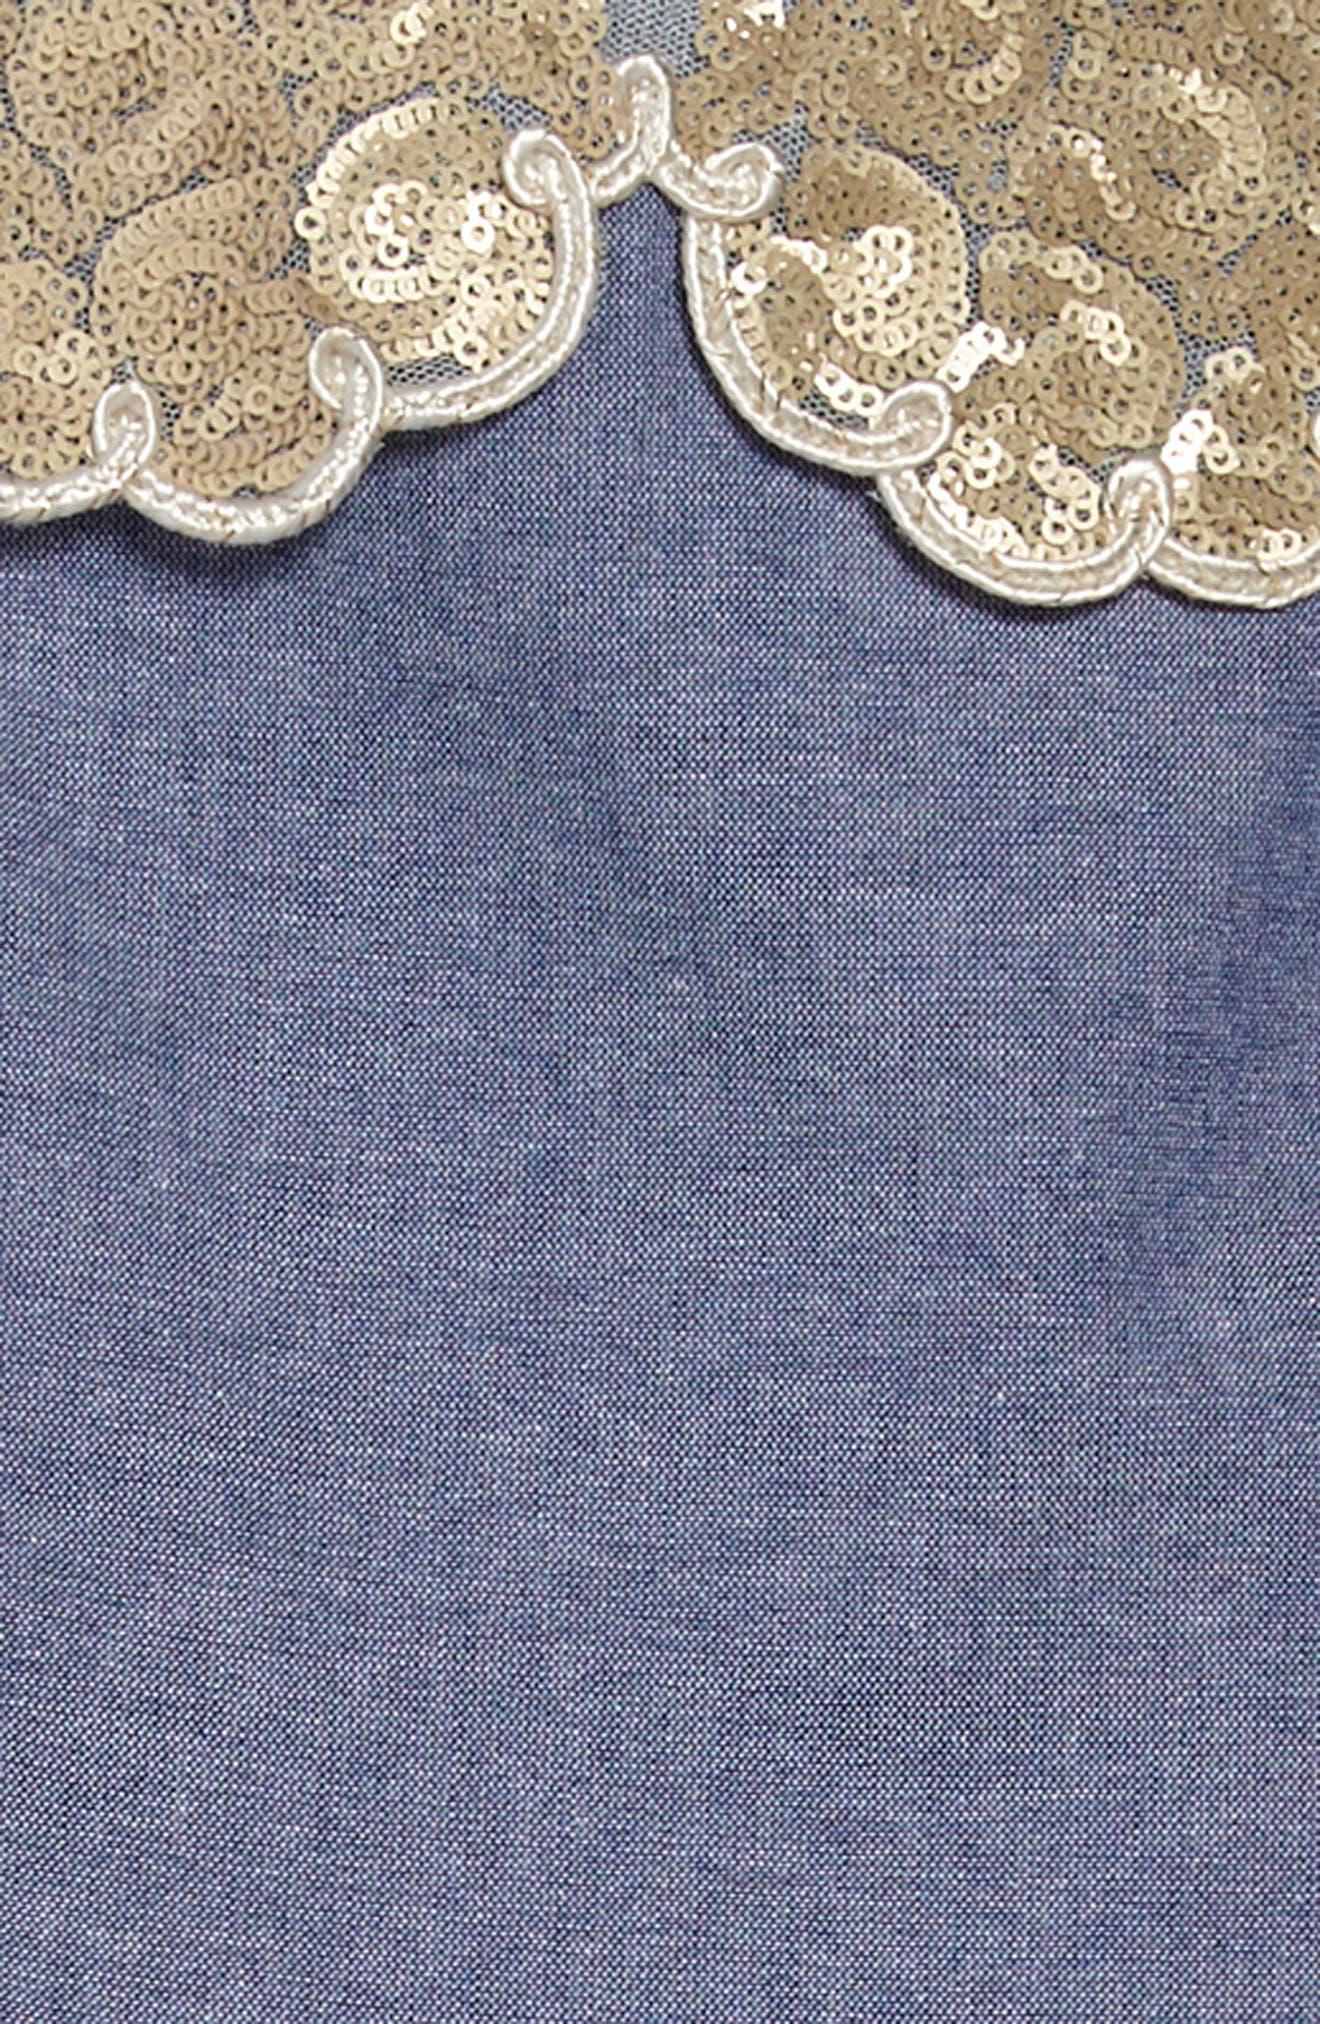 Alternate Image 3  - Fiveloaves Twofish Darcy Chambray Dress (Toddler Girls, Little Girls & Big Girls)